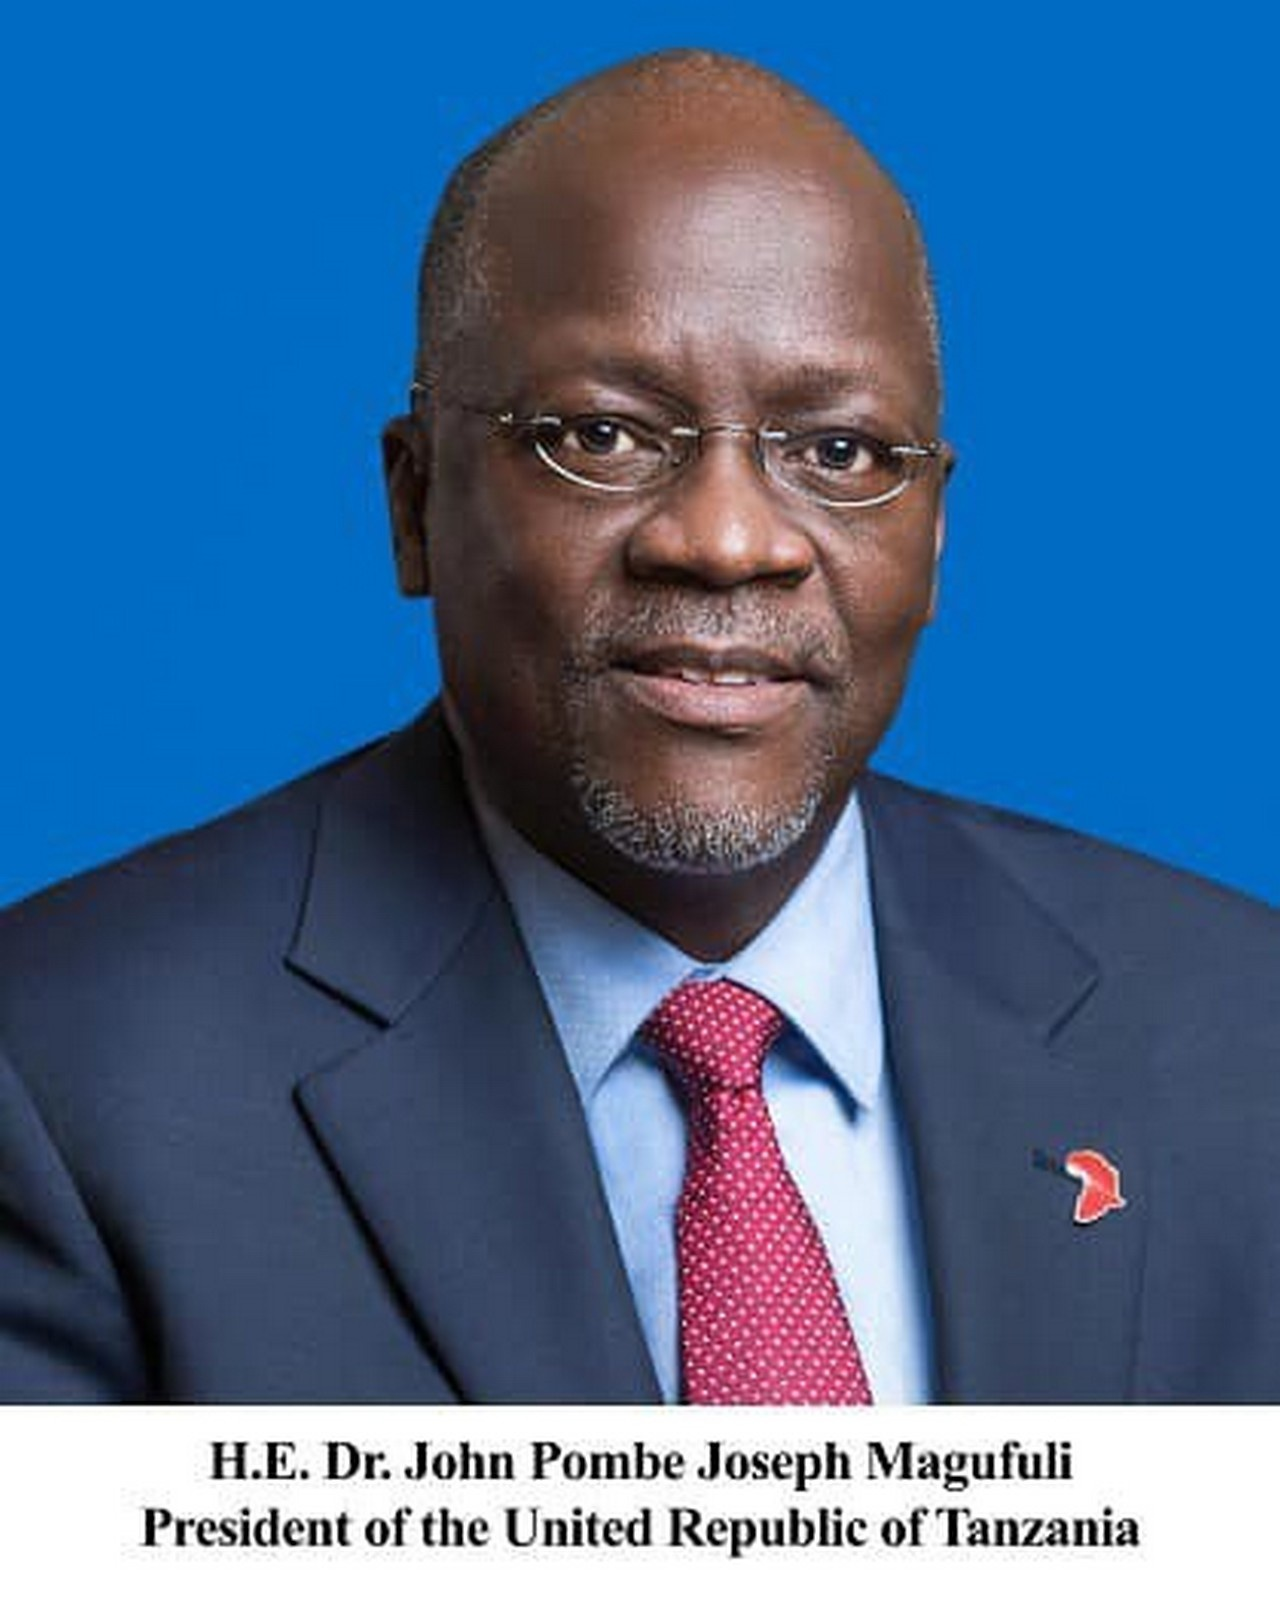 Президент Танзании Джон Магуфули провозгласил Танзанию свободной от COVID-19.